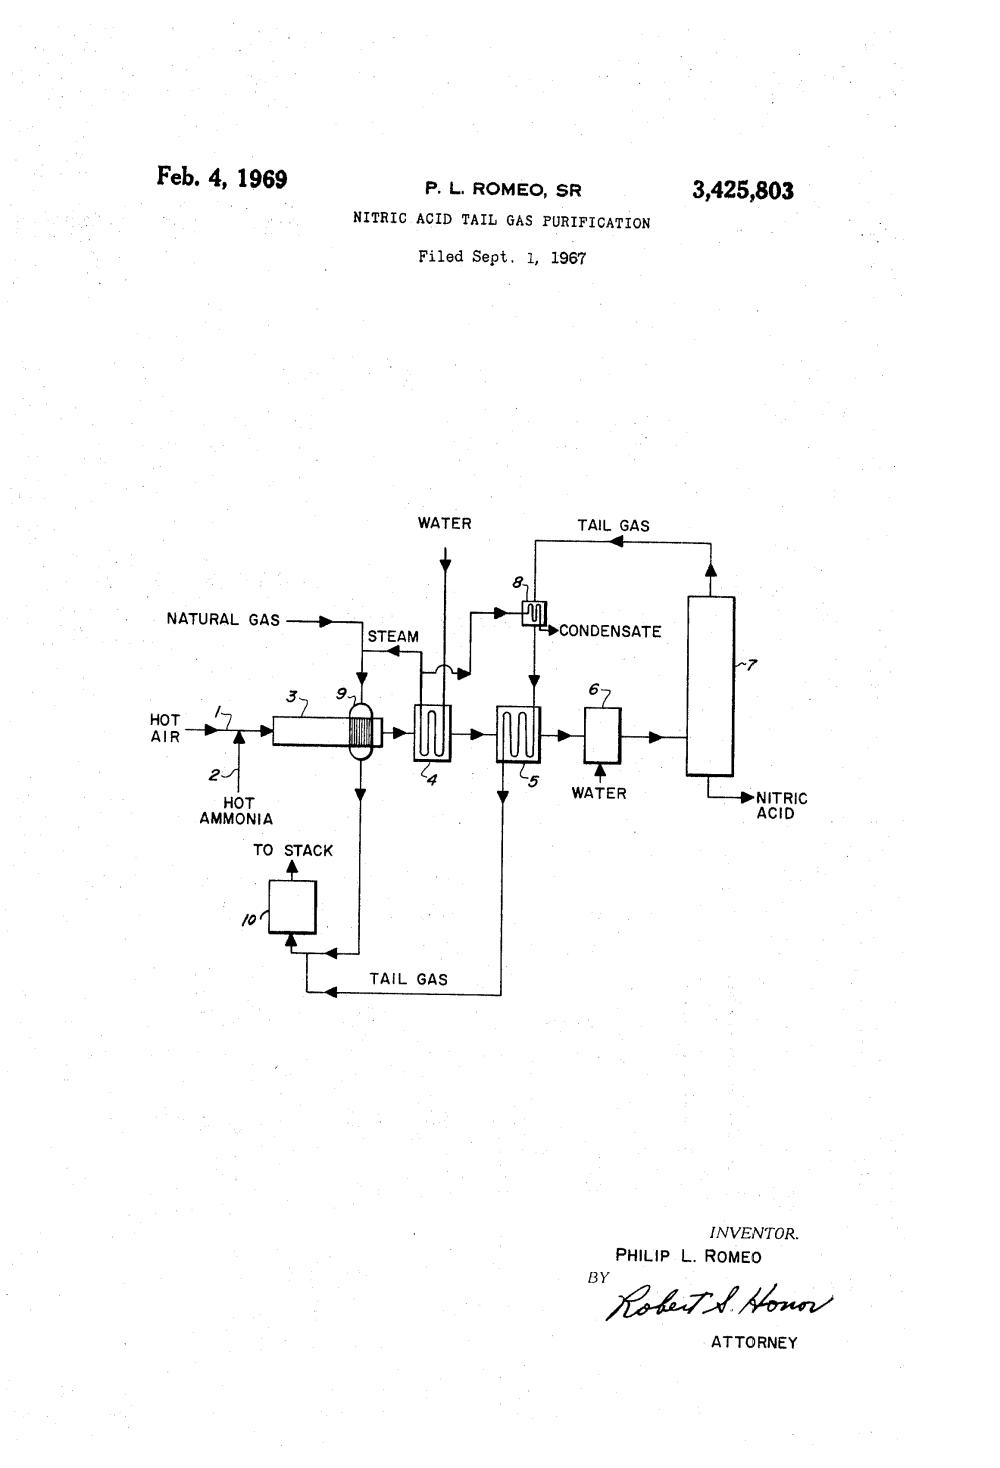 medium resolution of proces flow diagram nitric acid plant